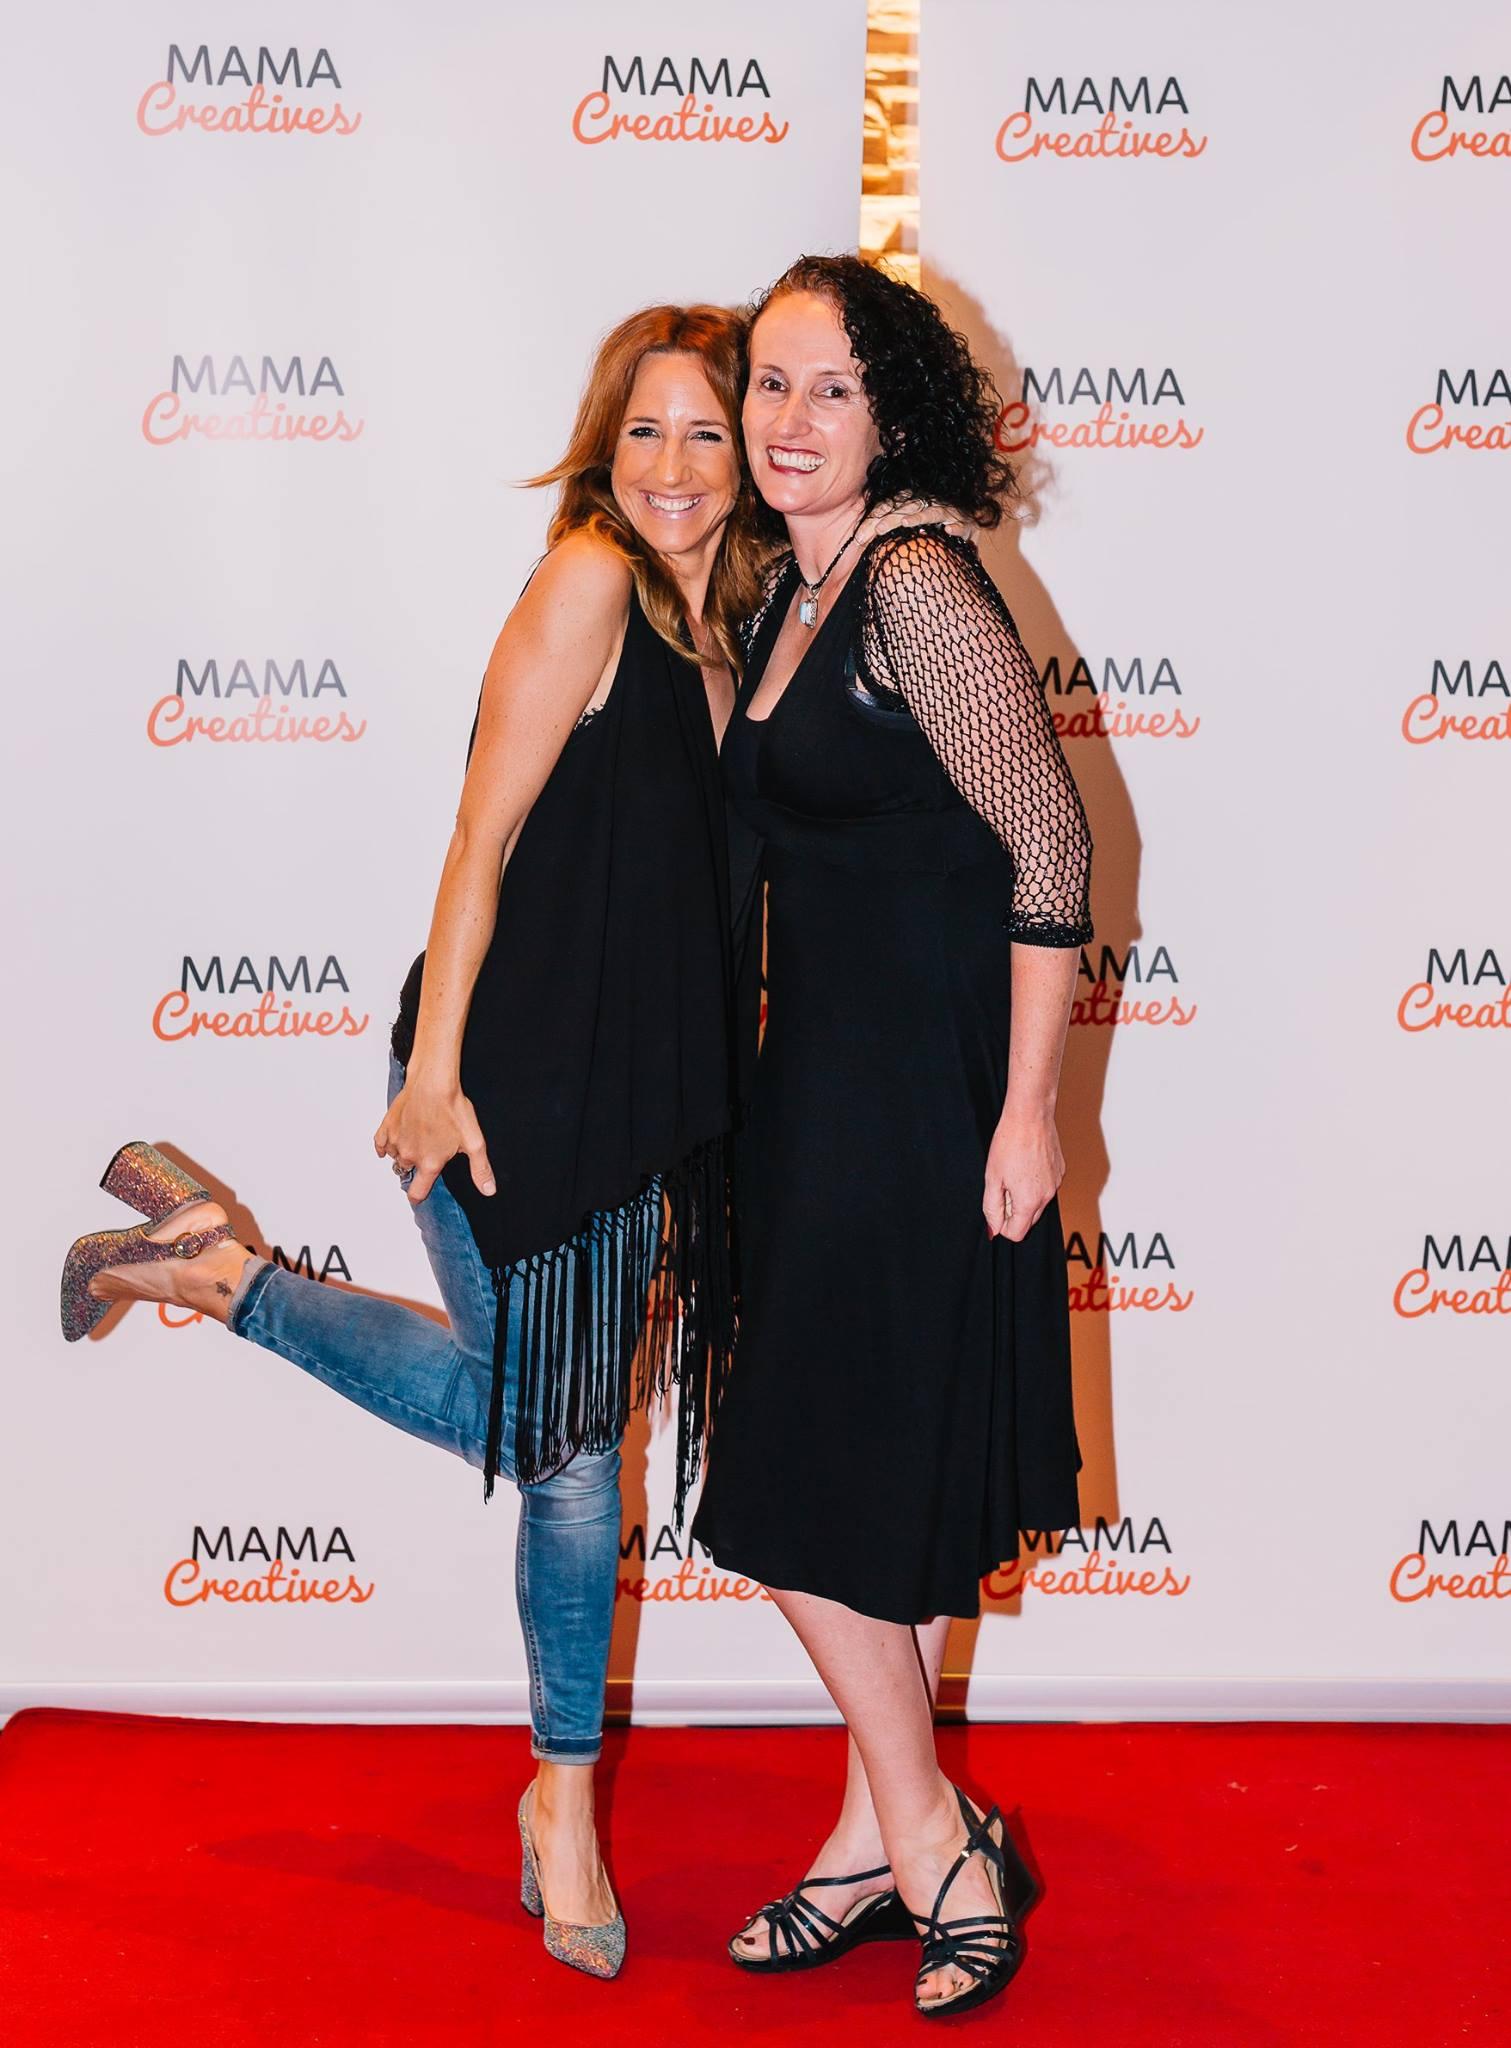 Having fun on the red carpet  — with Fern Madden and Sarah Gardan.